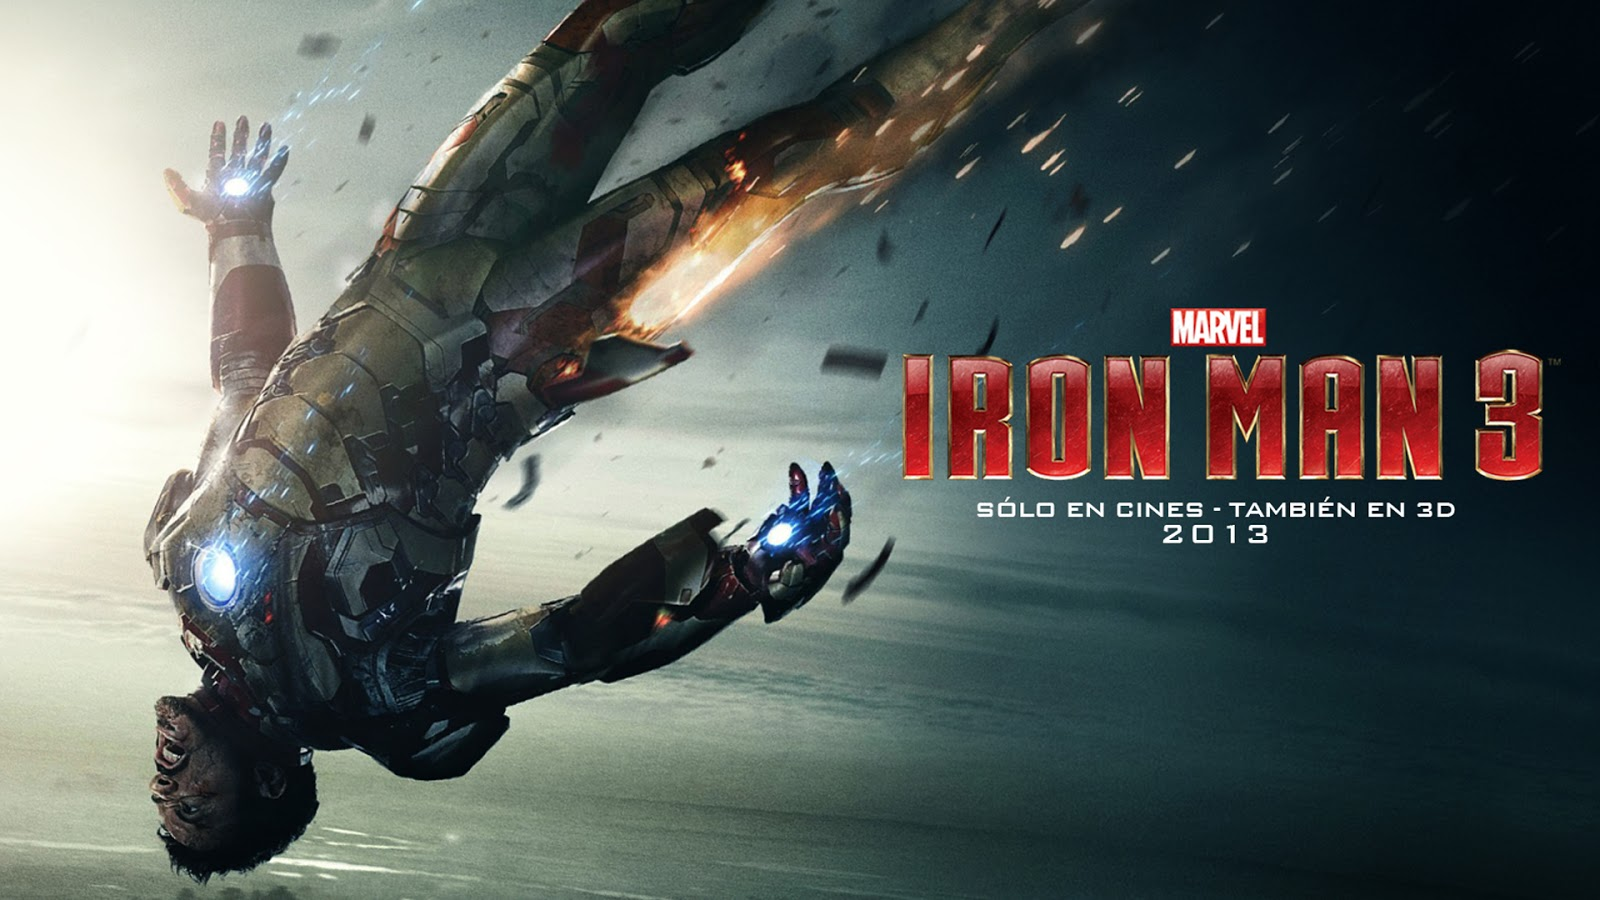 Iron Man 3 2013 Hd Wallpapers 1080p